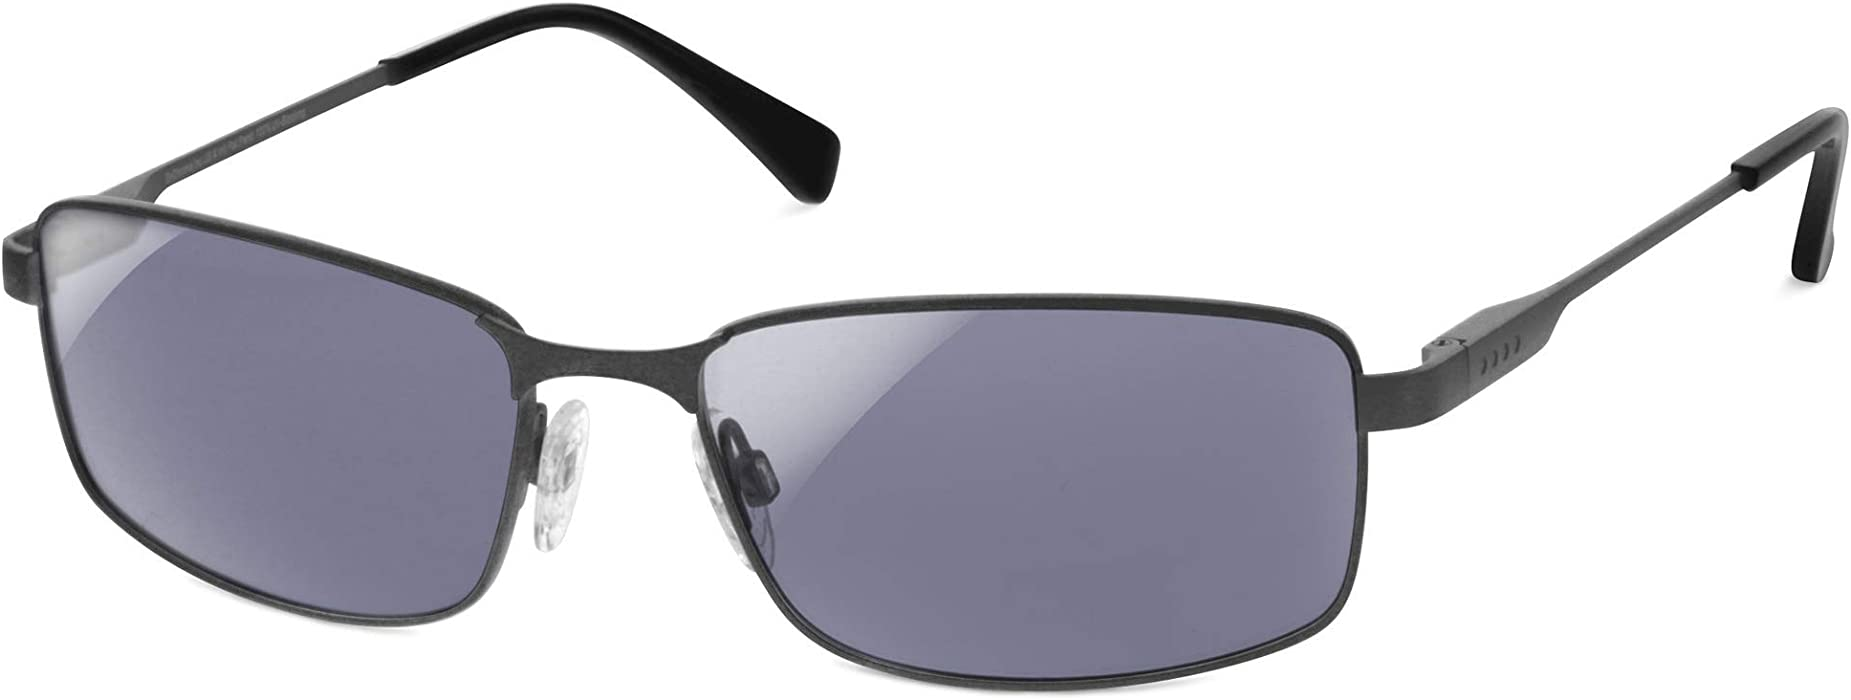 db481b100e81 EnChroma Color Blind Glasses - Canyon Gunmetal - Cx3 Sun For Deutan and  Protan Color Blindness